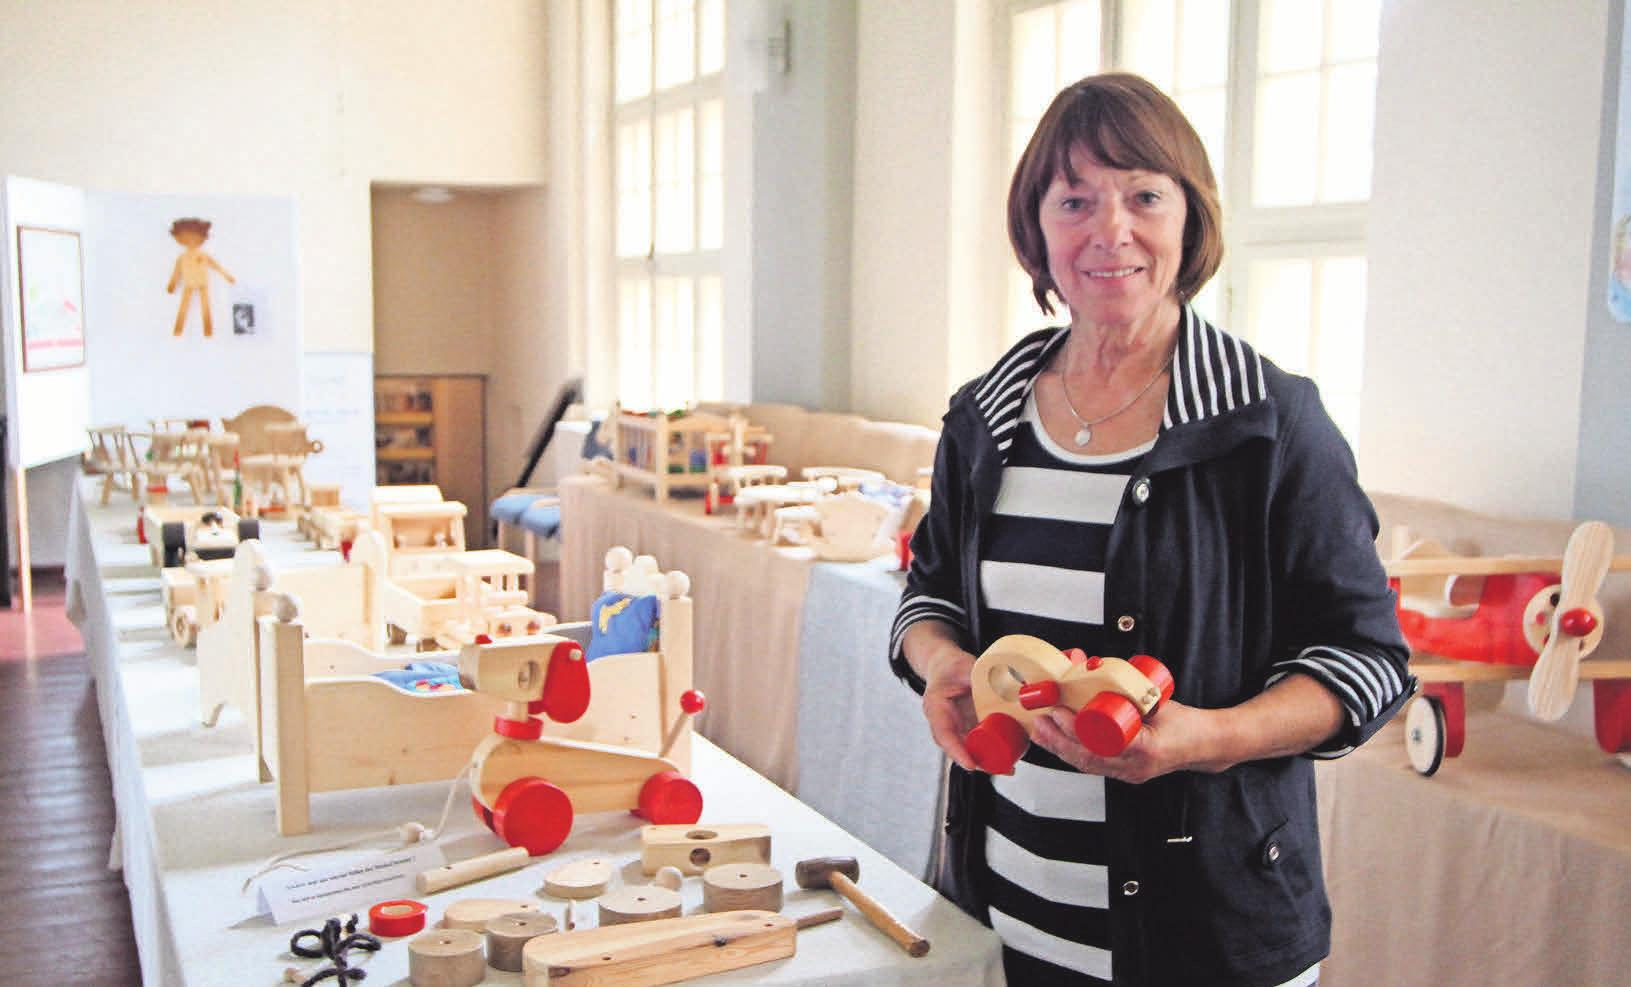 Holzgestalterin Hannelore Thielke ist bei der Kunstmeile dabei.FOTOS: LAURA SANDER, TANJA M. MAROTZKE